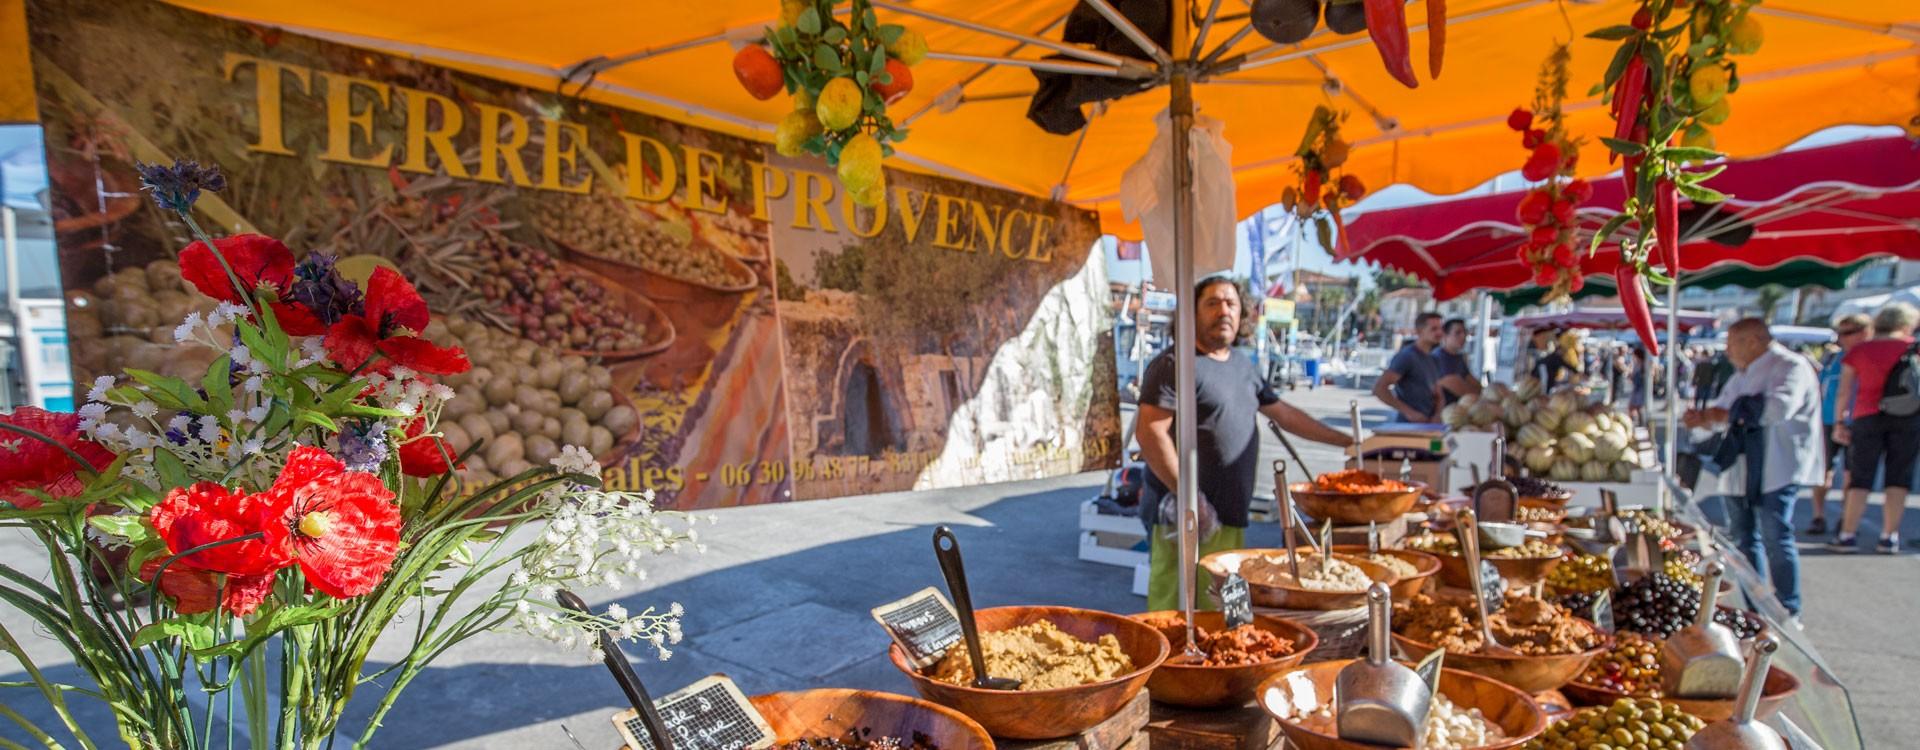 Le Brusc Provencal market